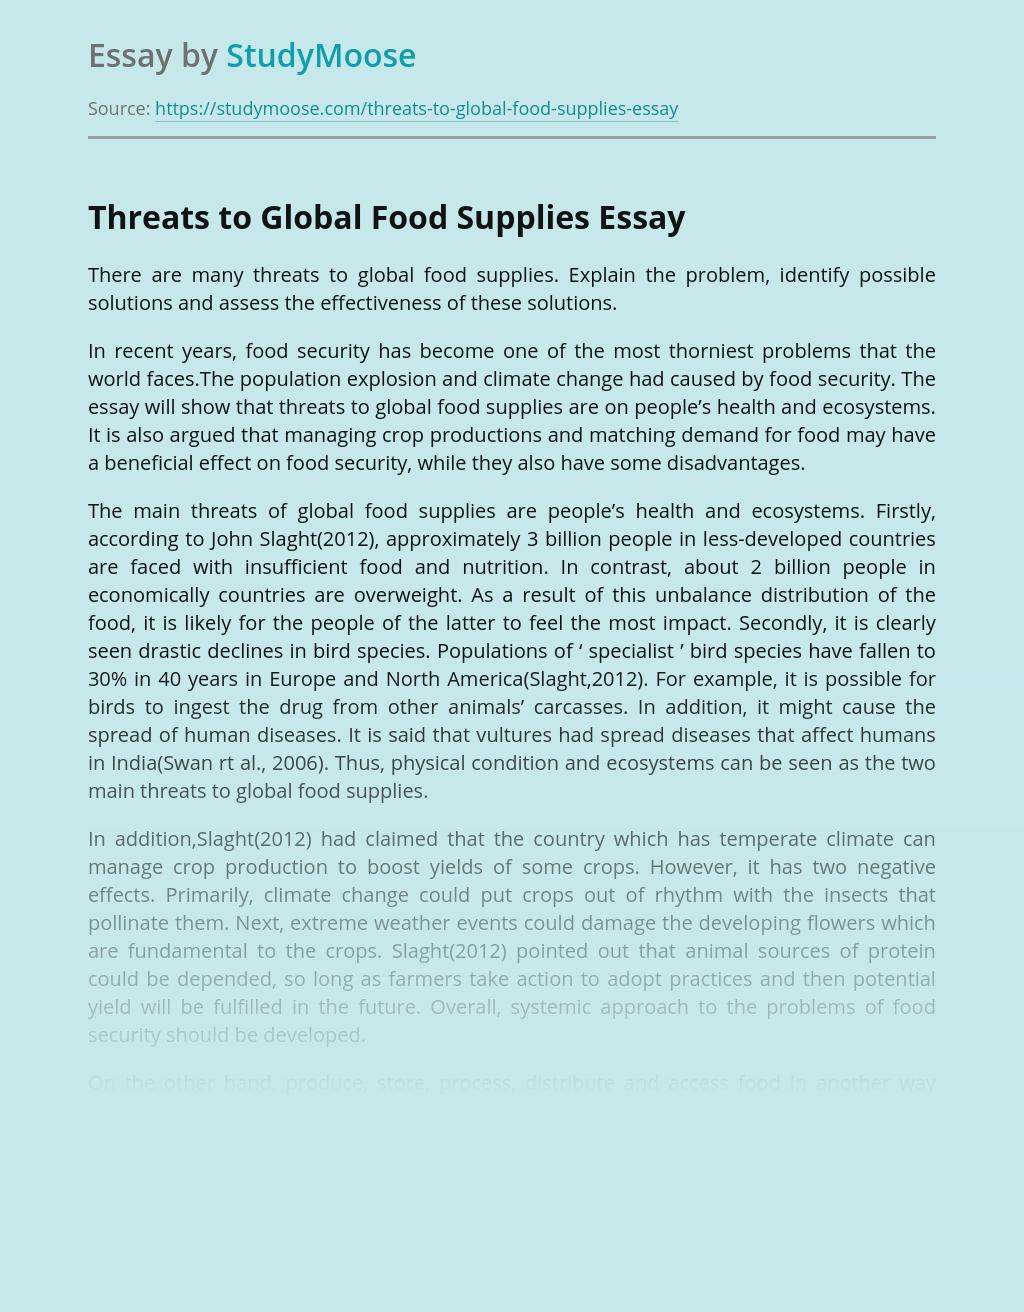 Threats to Global Food Supplies